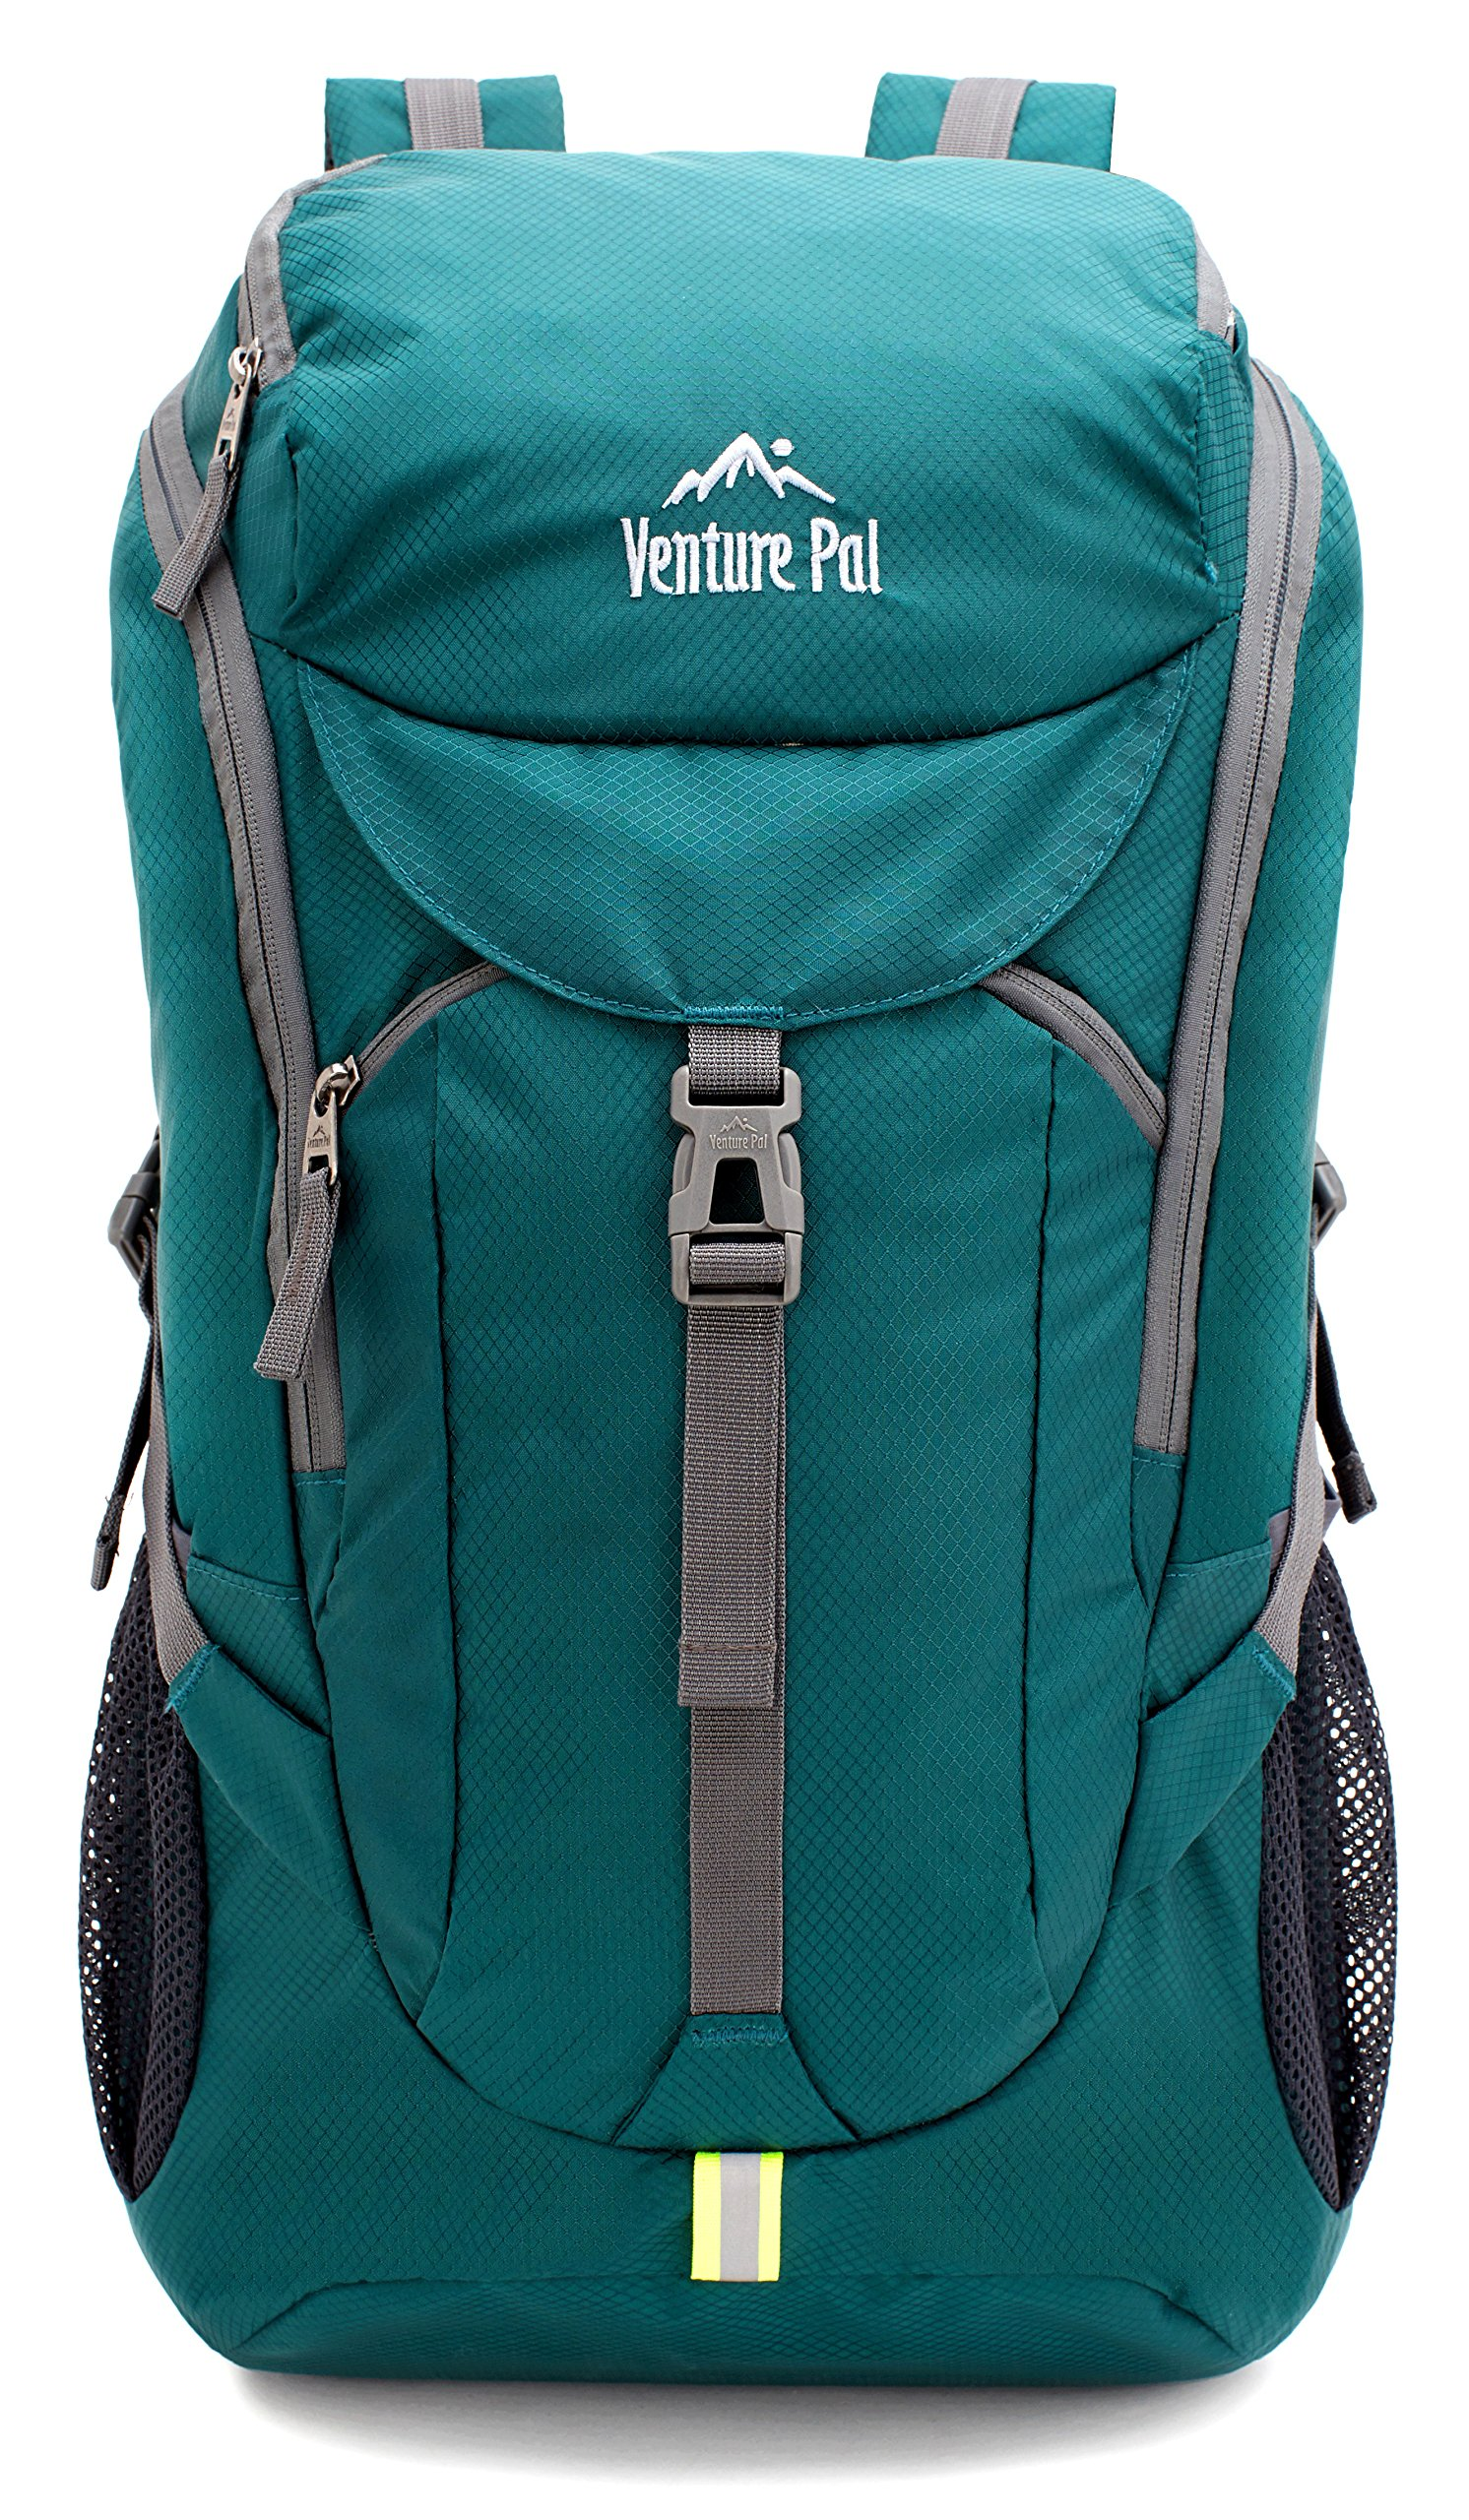 Venture Pal Hiking Backpack - Packable Durable Lightweight Travel Backpack Daypack for Women Men(Green) …